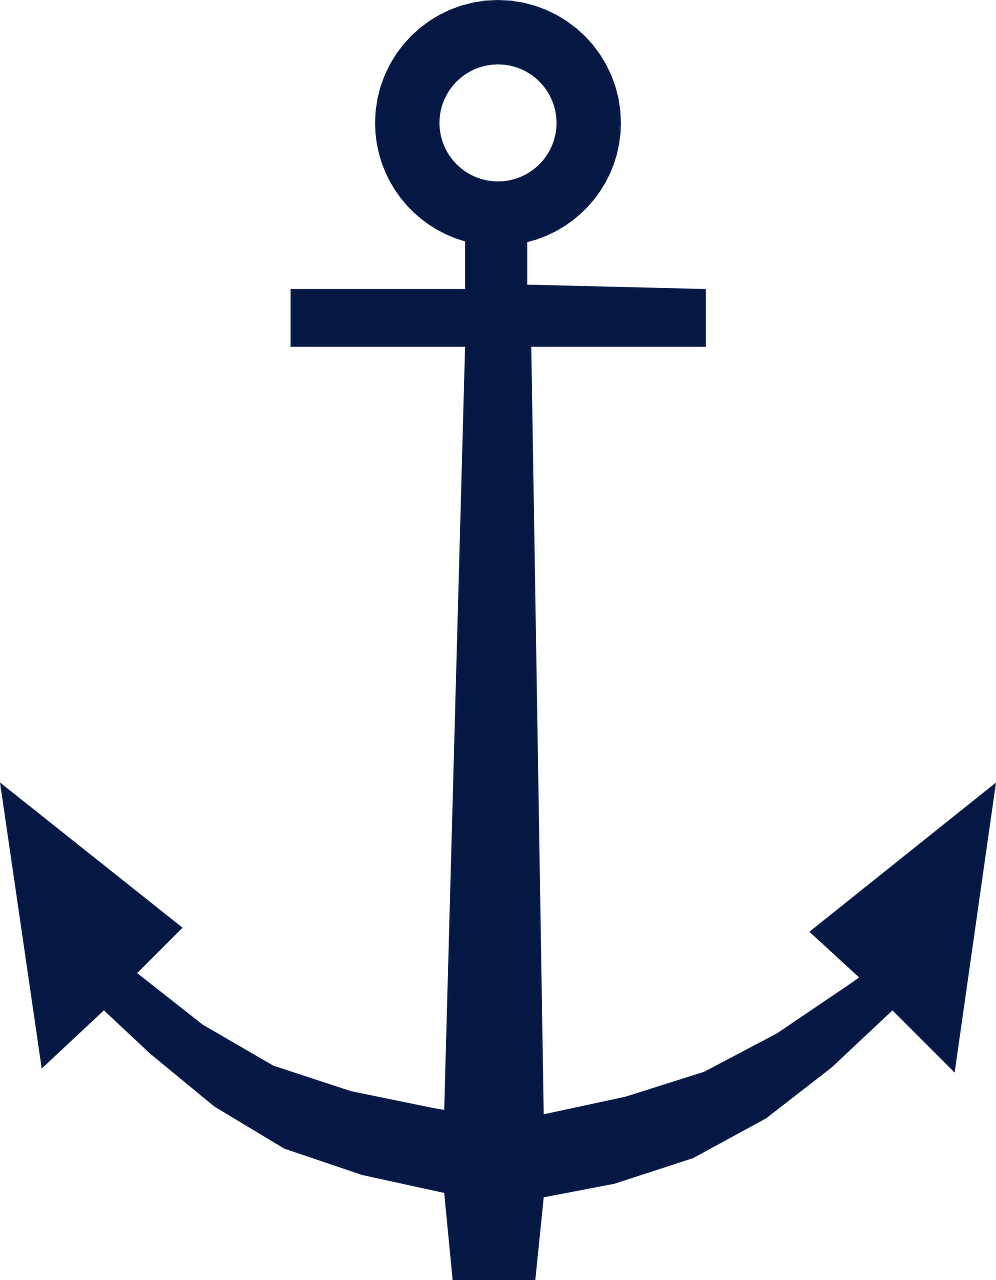 Anchor,blue,symbol,design,nautical.